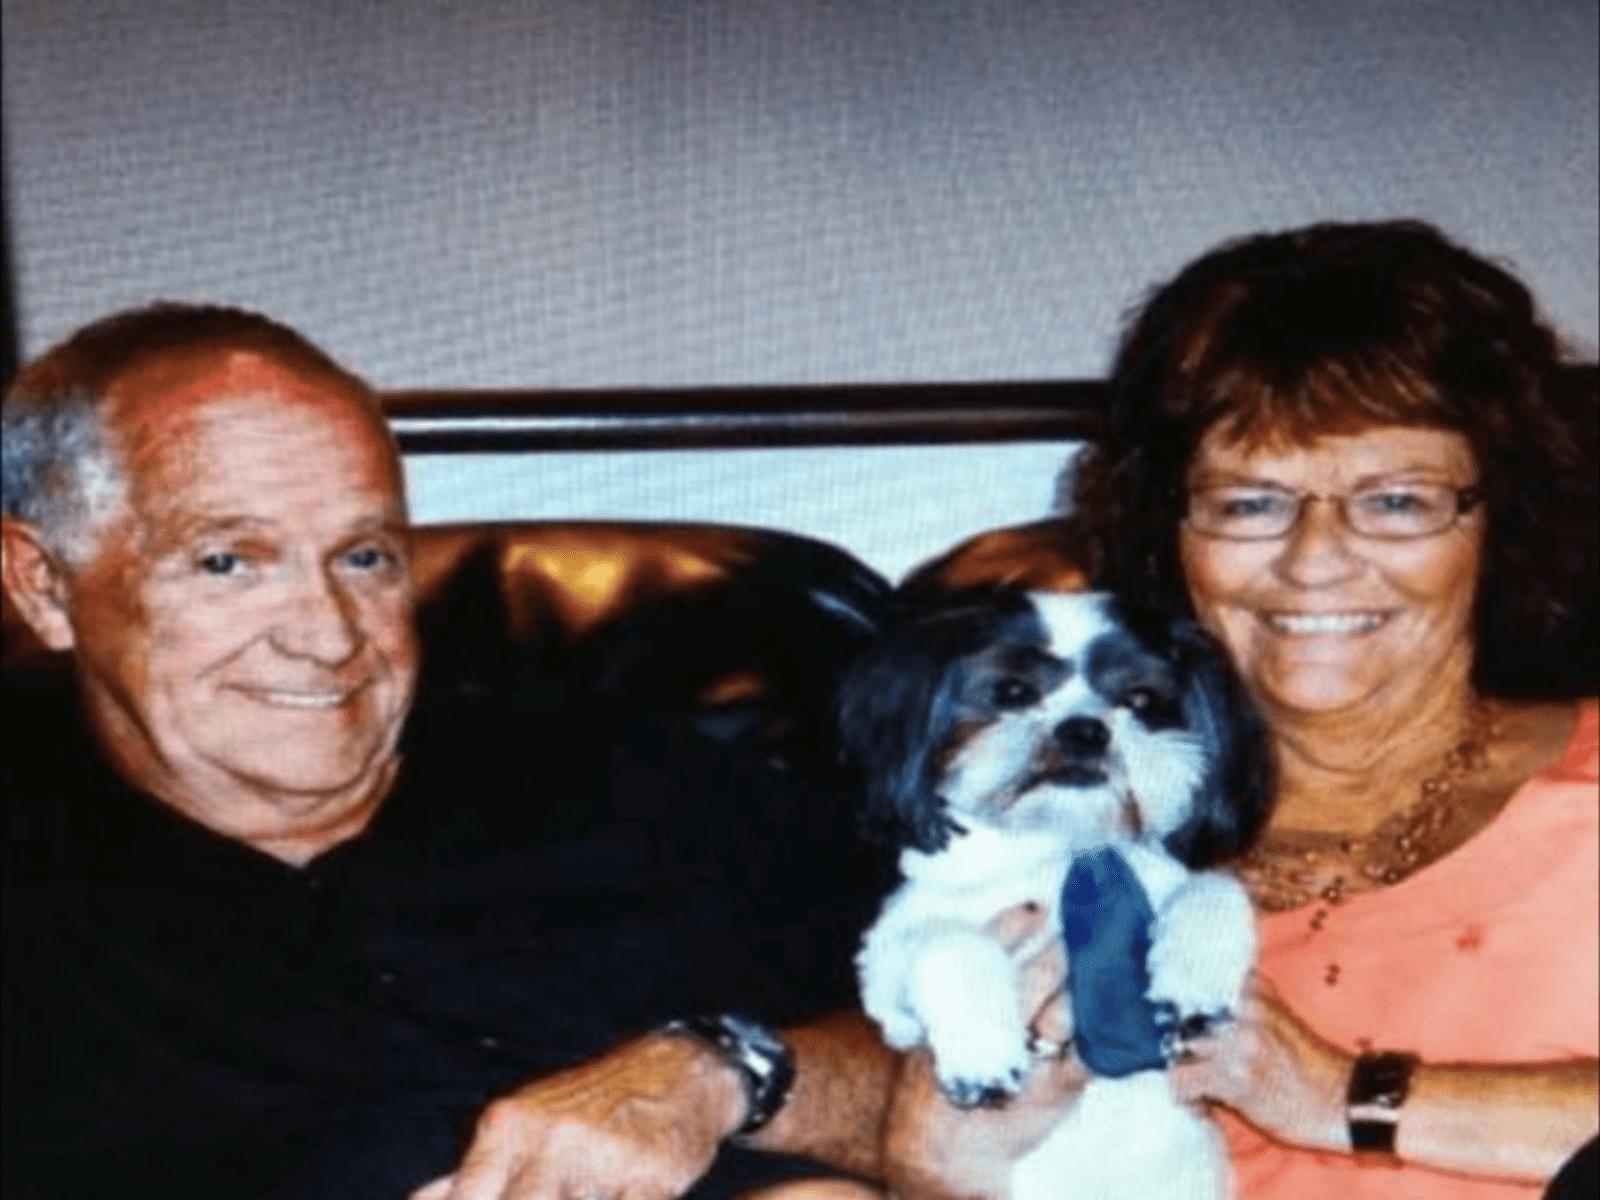 Gene & Lynn from Brandon, Manitoba, Canada